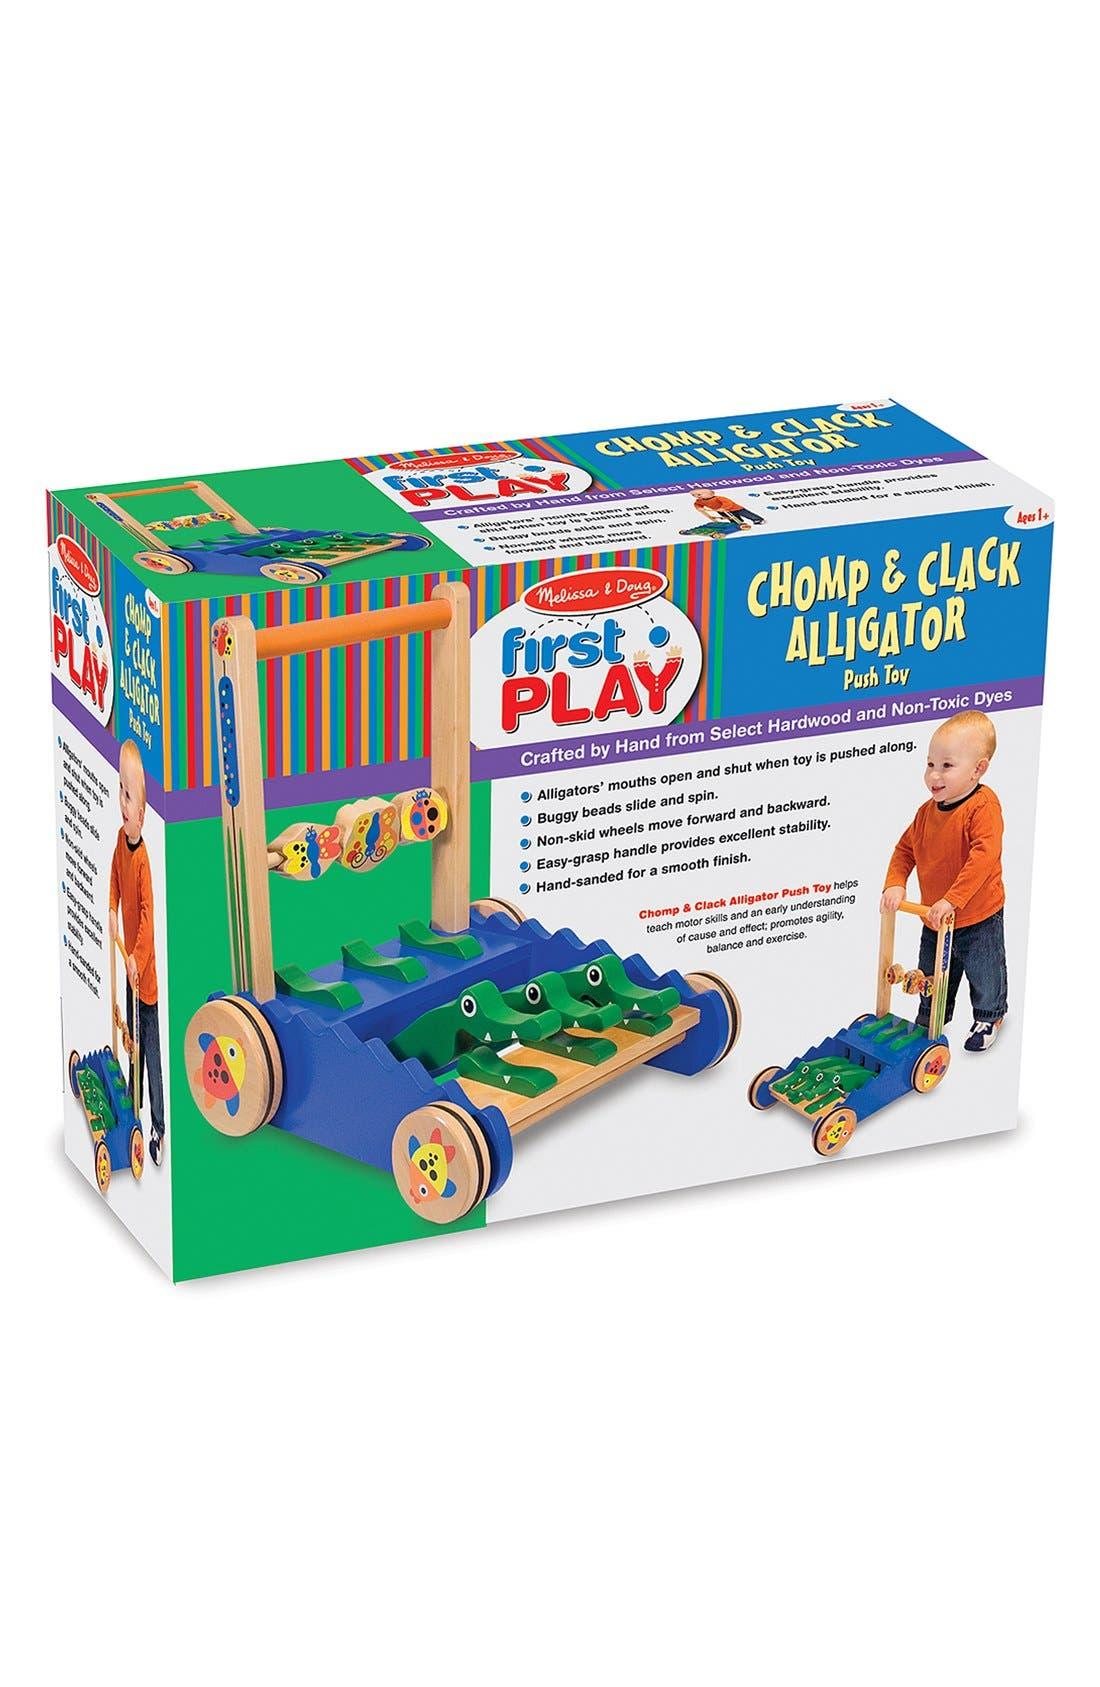 'Chomp & Clack' Personalized Alligator Push Toy,                             Alternate thumbnail 4, color,                             BLUE